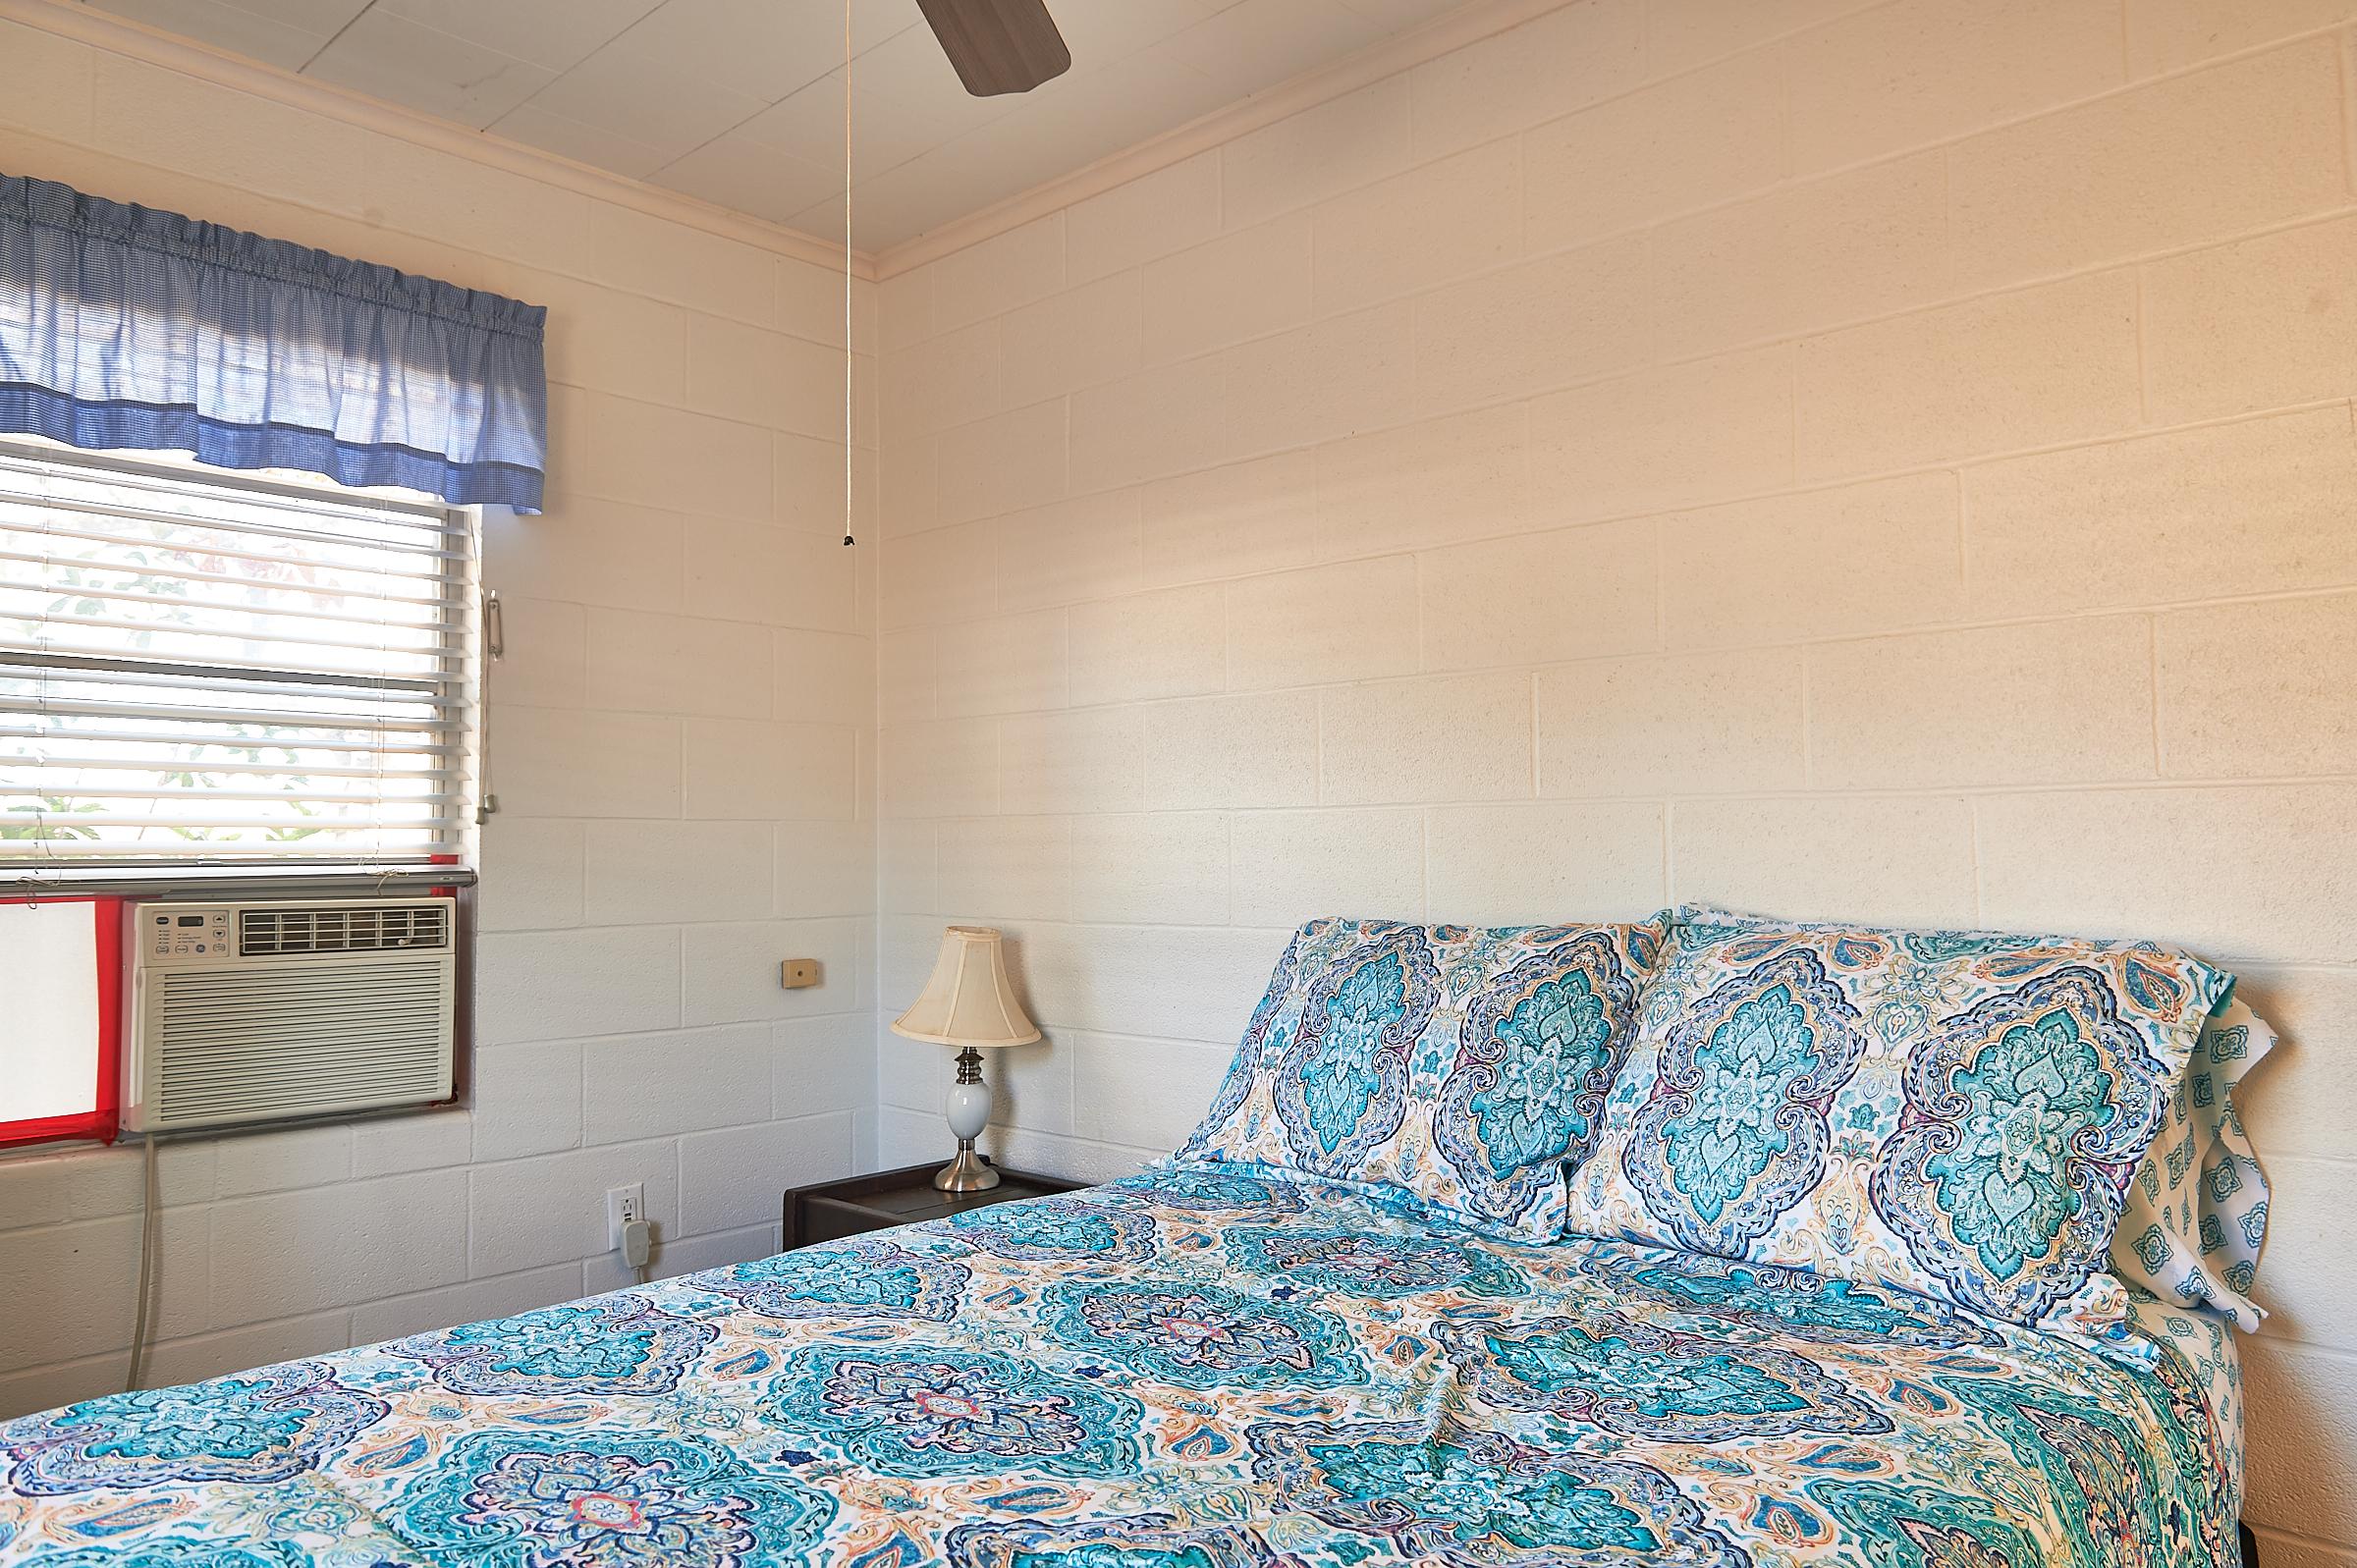 Bluebonnet Cabin Spare Bedroom Image 5